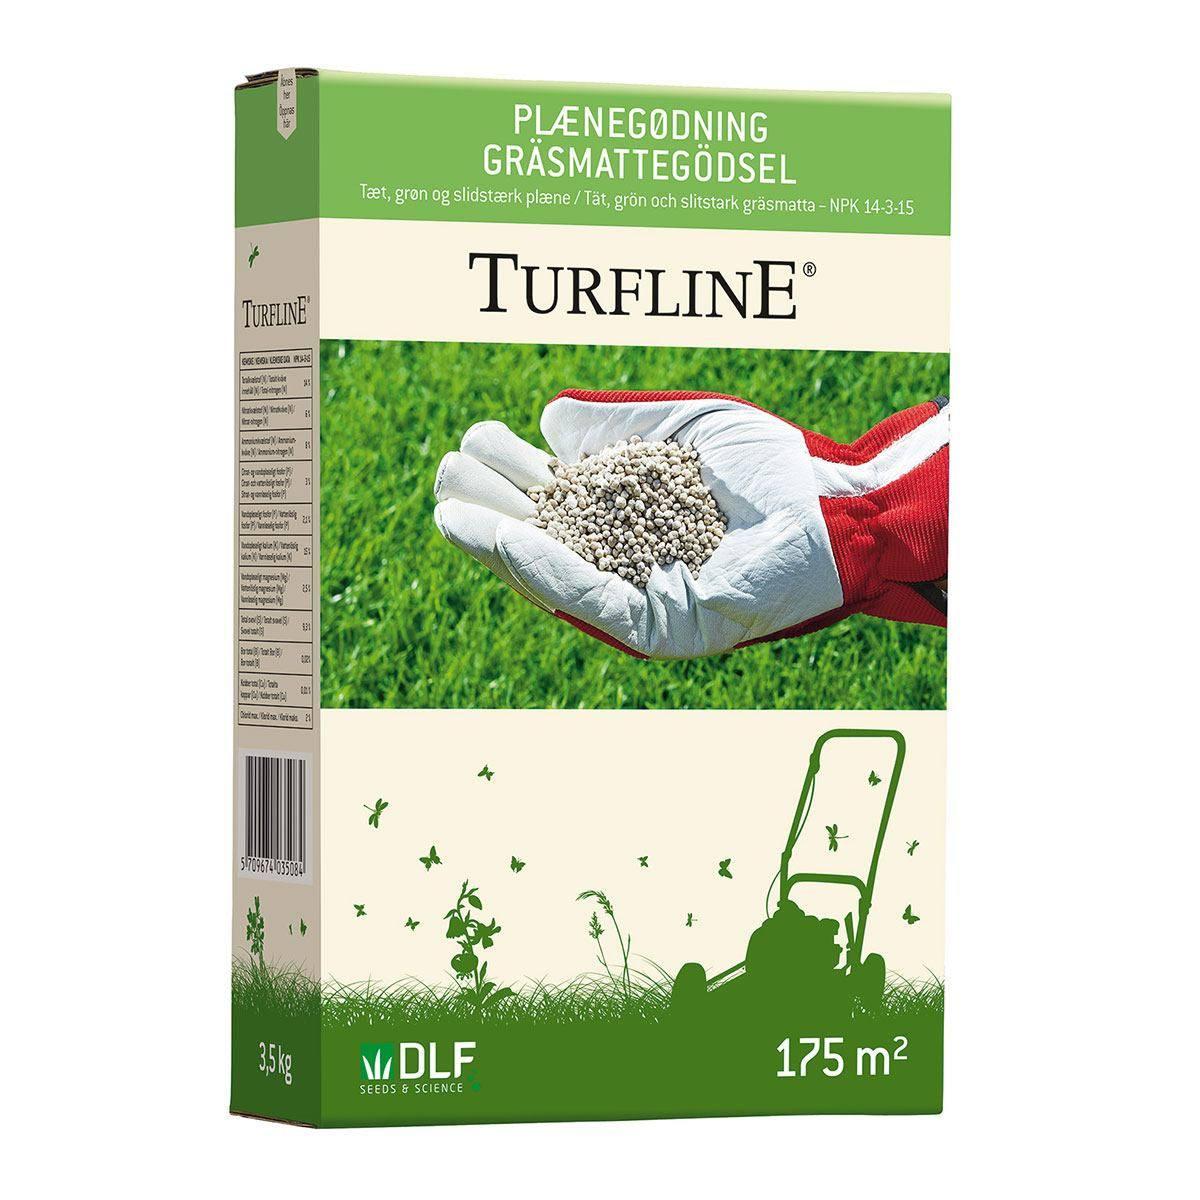 Turfline Plænegødning (mineralsk) - 3,5 kg / 175 m2